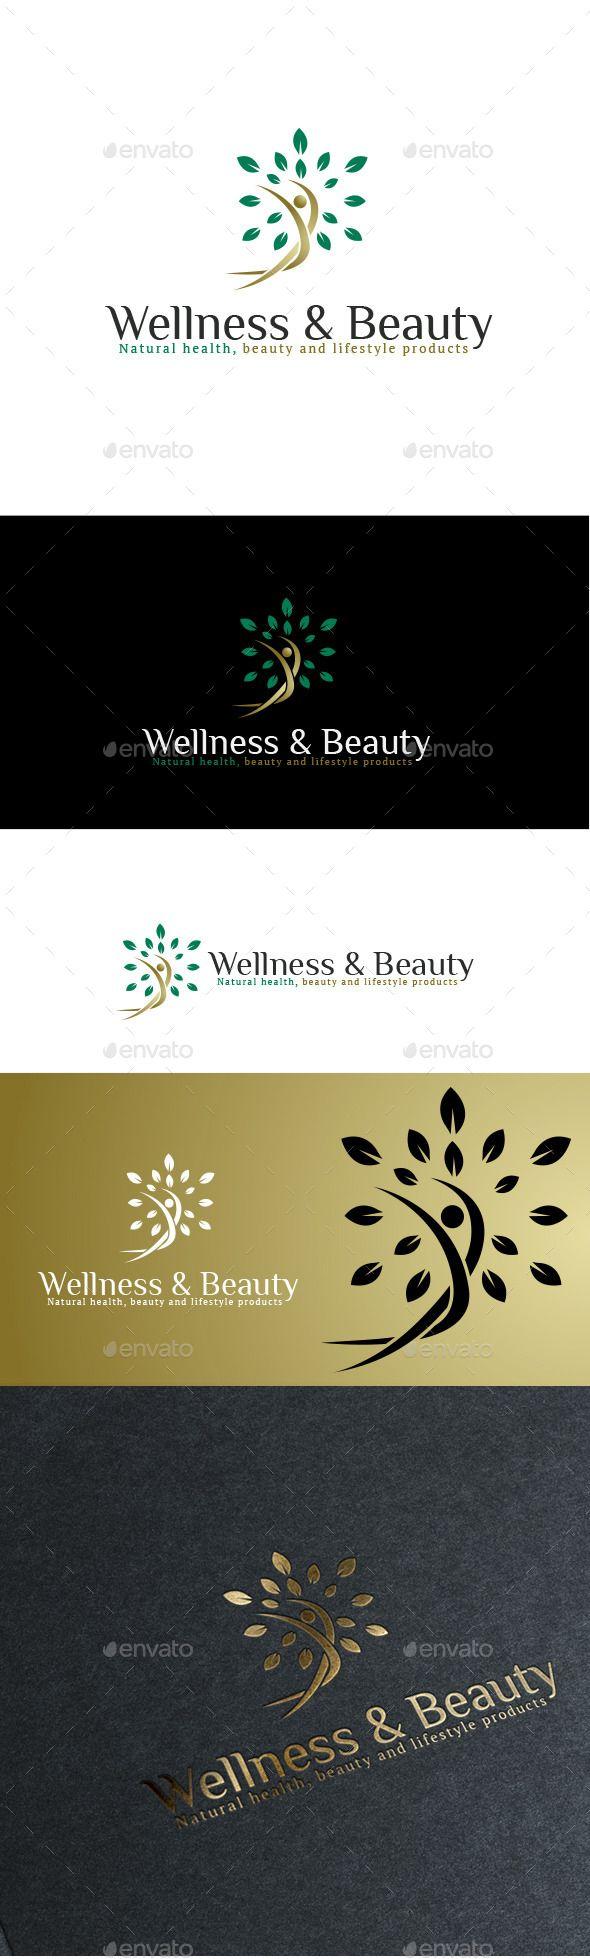 Naturals Wellness & Beauty - Logo Design Template Vector #logotype Download it here: http://graphicriver.net/item/naturals-wellness-beauty-logo/11020755?s_rank=560?ref=nexion